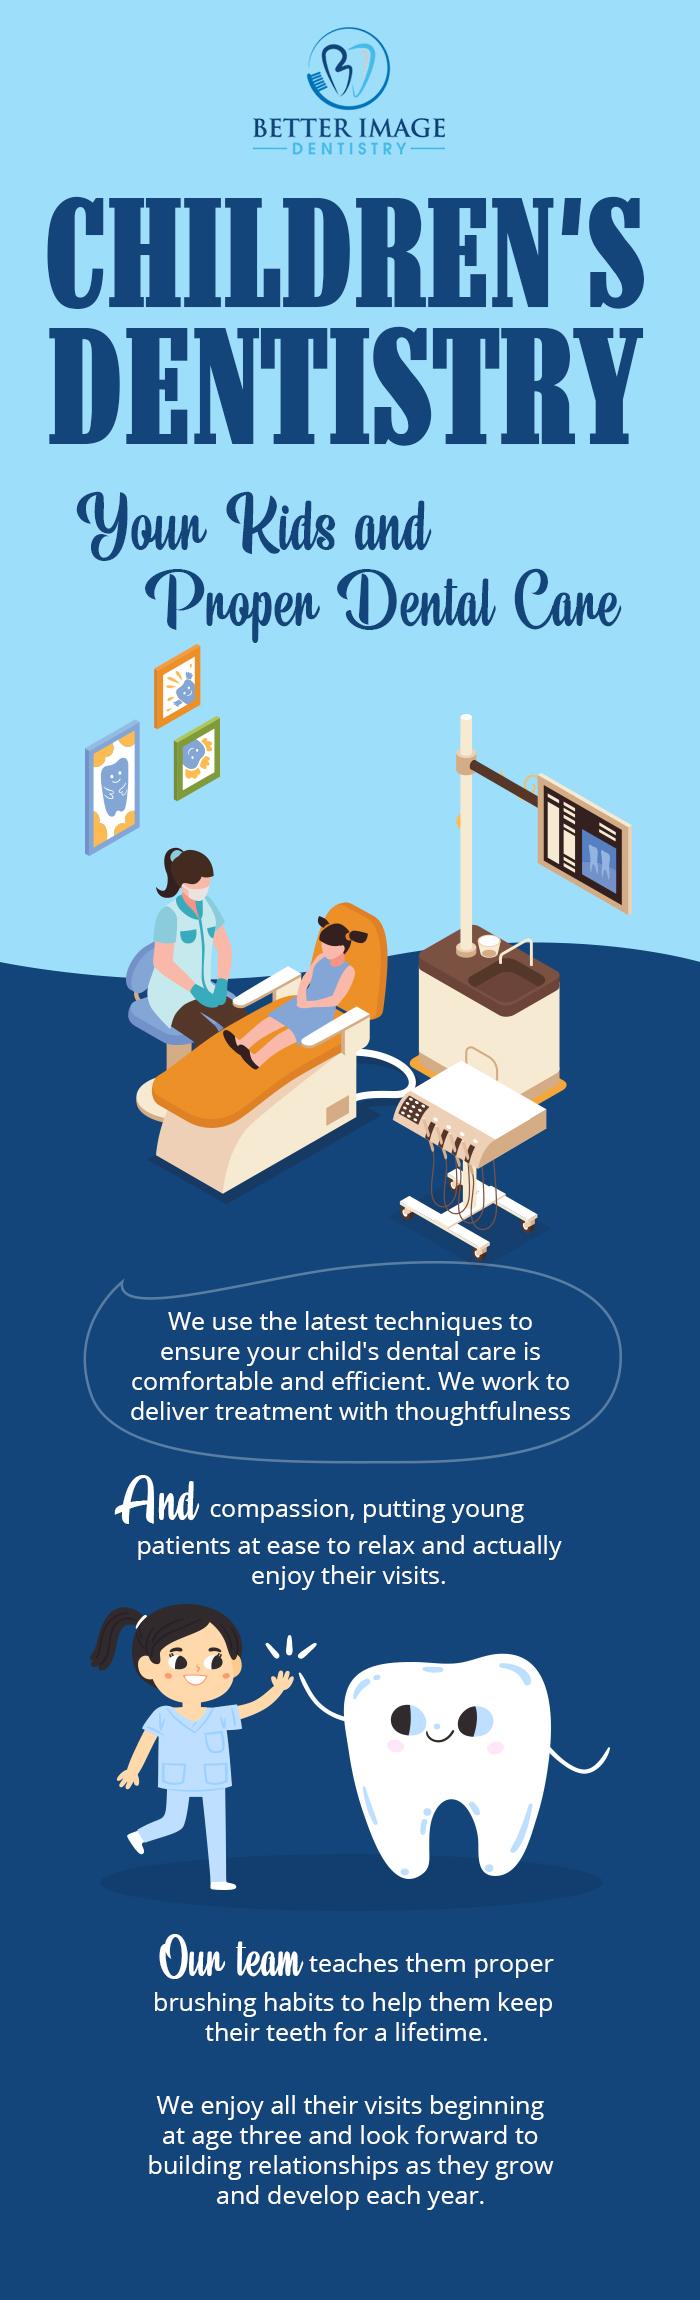 Better Image Dentistry – Safe and Gentle Children's Dentistry in Bridgewater, NJ